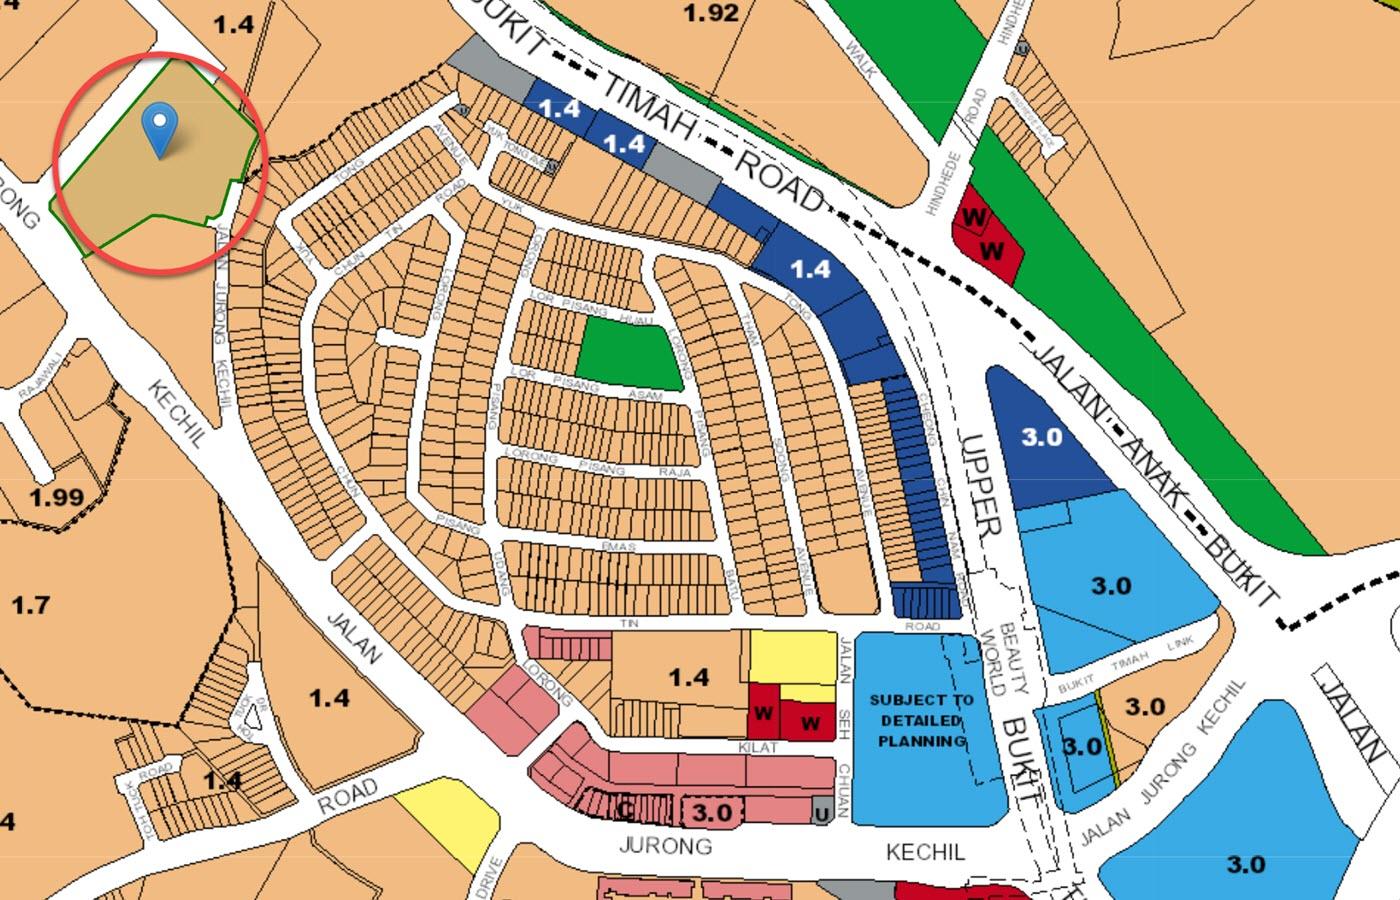 Verdale Condo Location - URA Master Plan Map